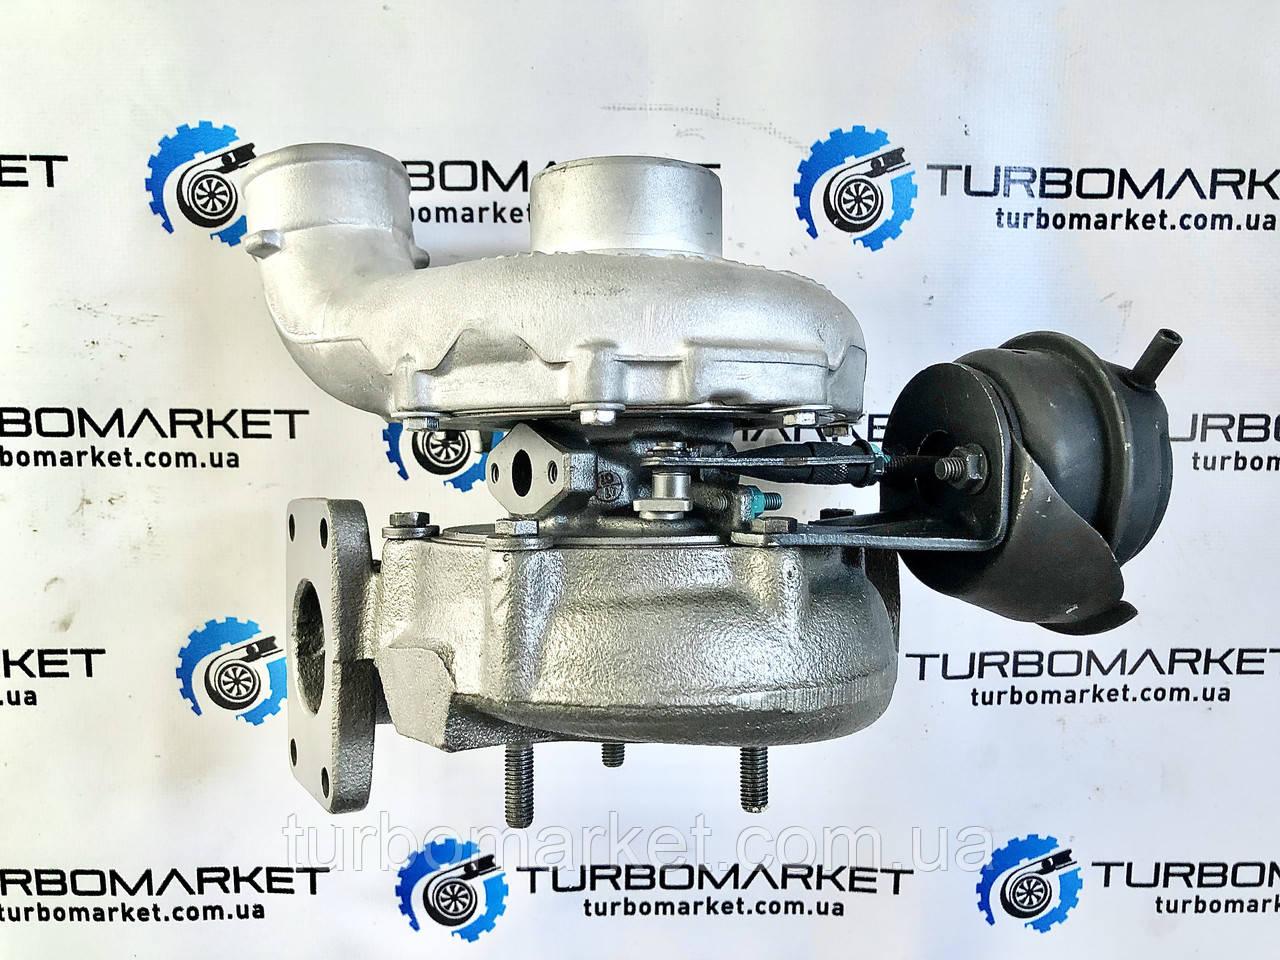 Турбина Audi A4/A6 2.5 TDI (B6/C5) / Skoda Superb I 2.5 TDI / VW B5 454135-0004